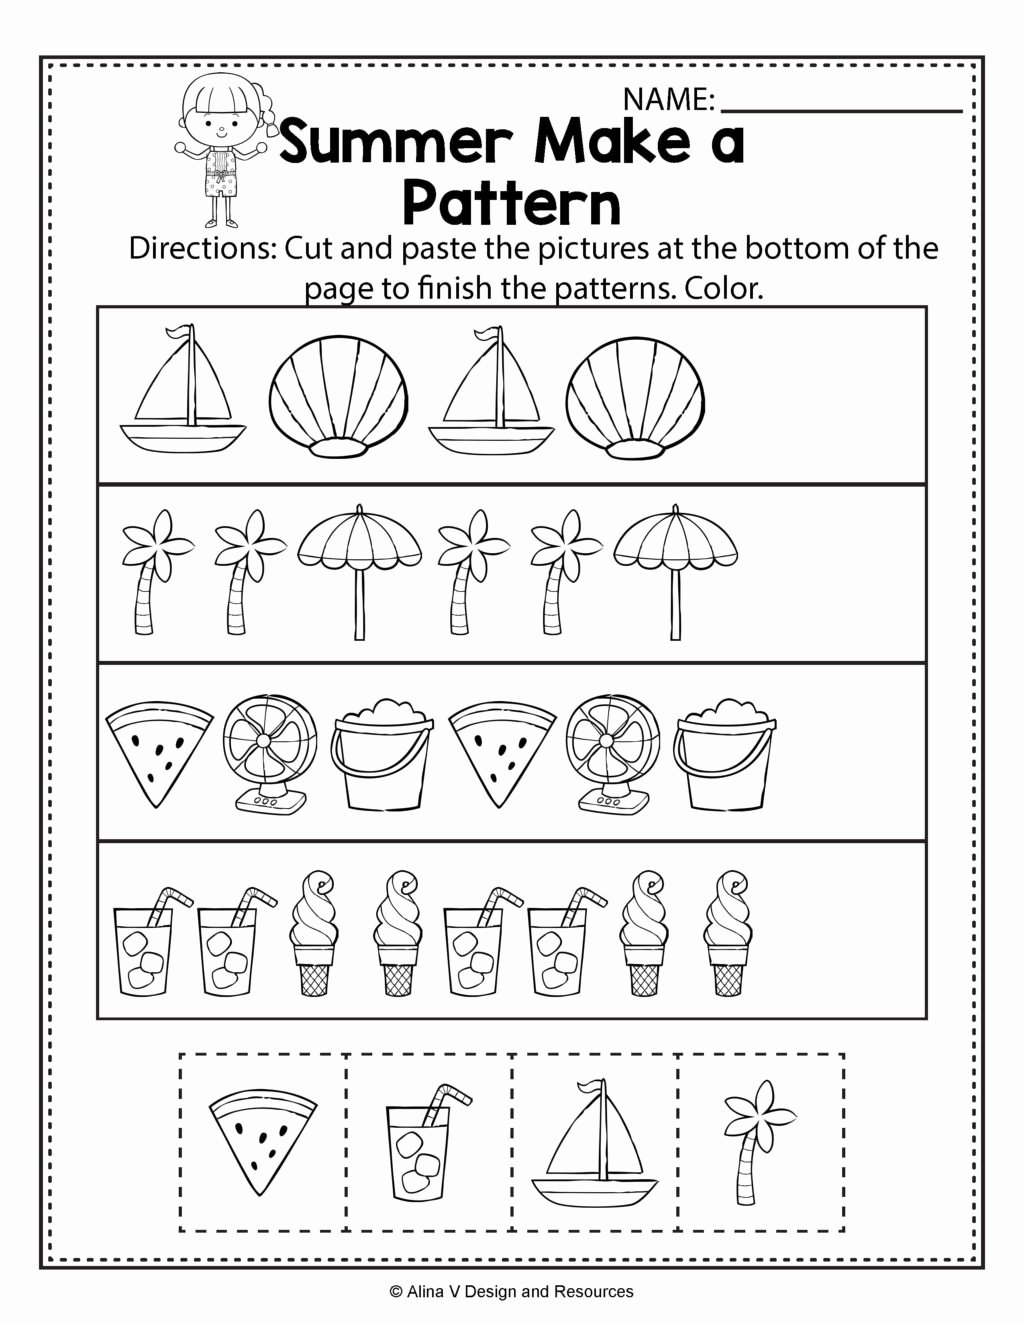 Science Worksheets for Preschoolers Lovely Worksheet Free Science Worksheet Preschool to